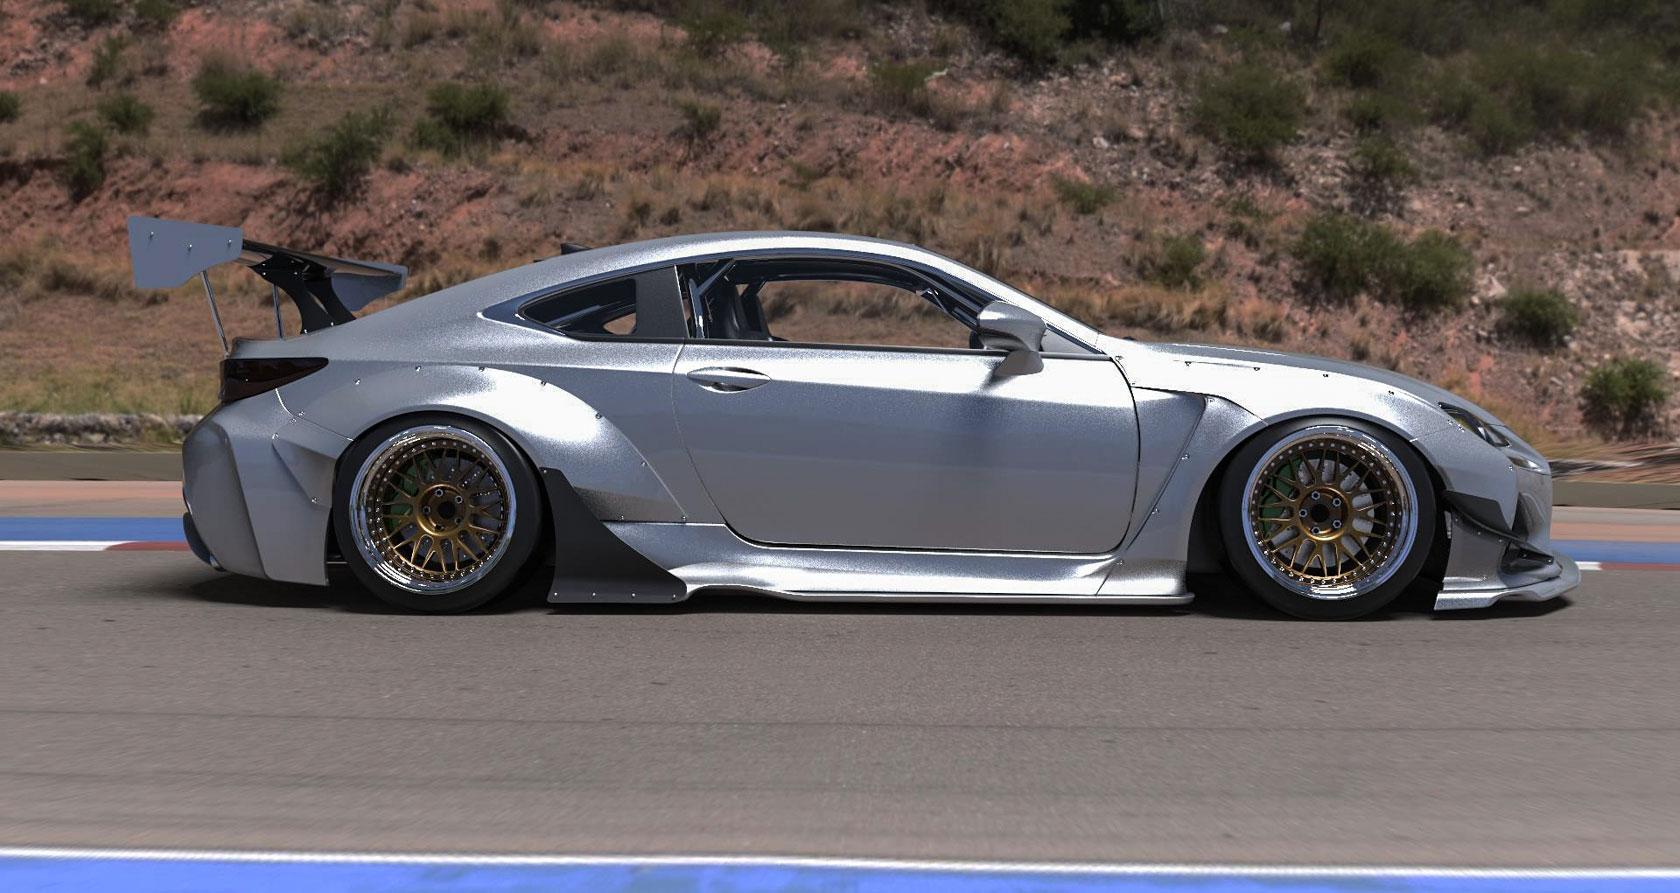 Lexus Rc F Rocket Bunny Side